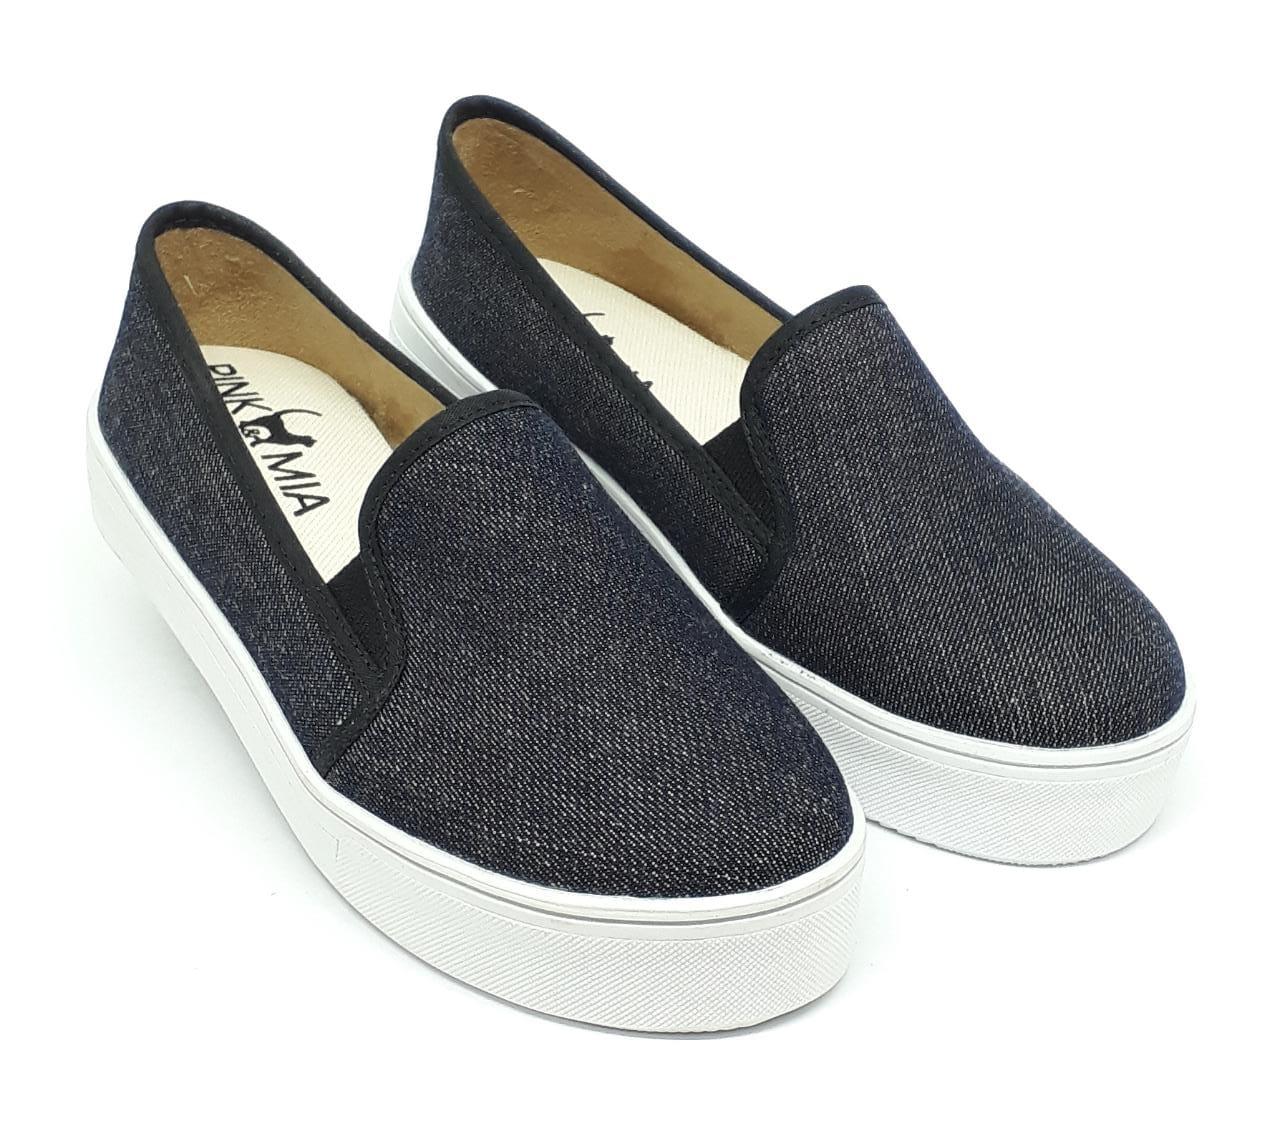 Slipper Encantus Jeans